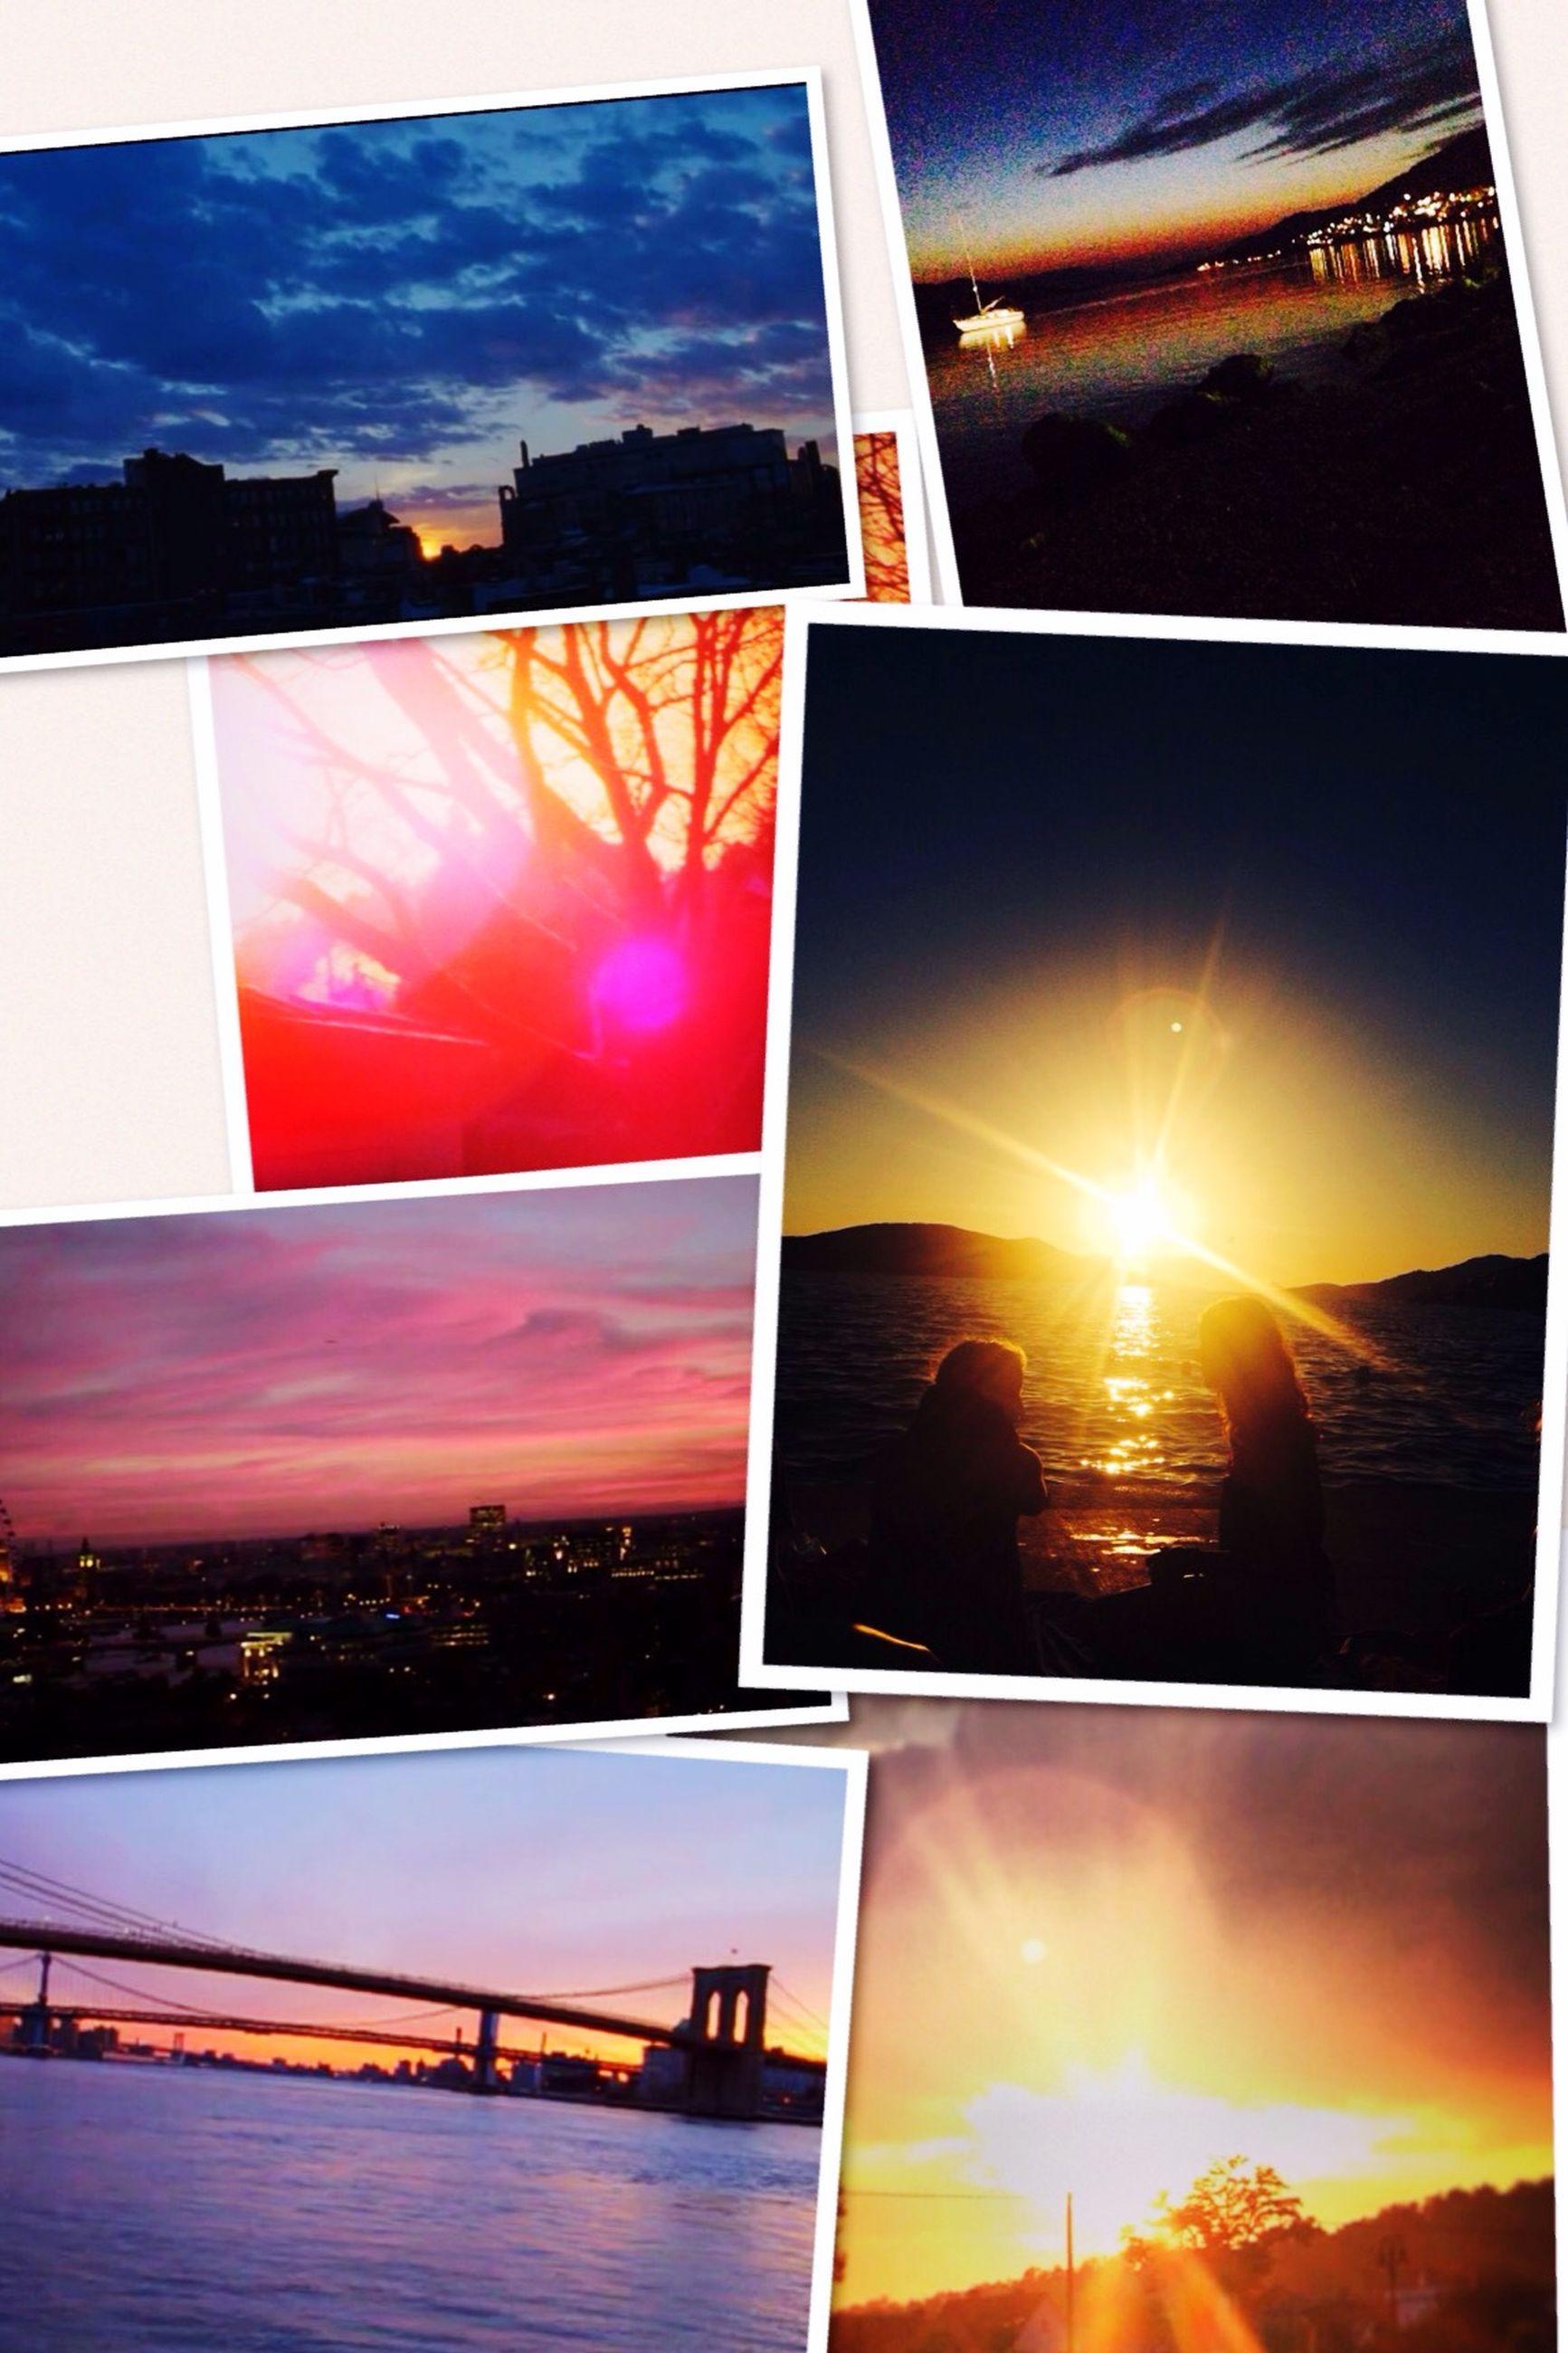 sun, sunset, architecture, built structure, sunlight, sky, building exterior, sunbeam, orange color, lens flare, reflection, cloud - sky, silhouette, cloud, city, no people, nature, water, outdoors, scenics